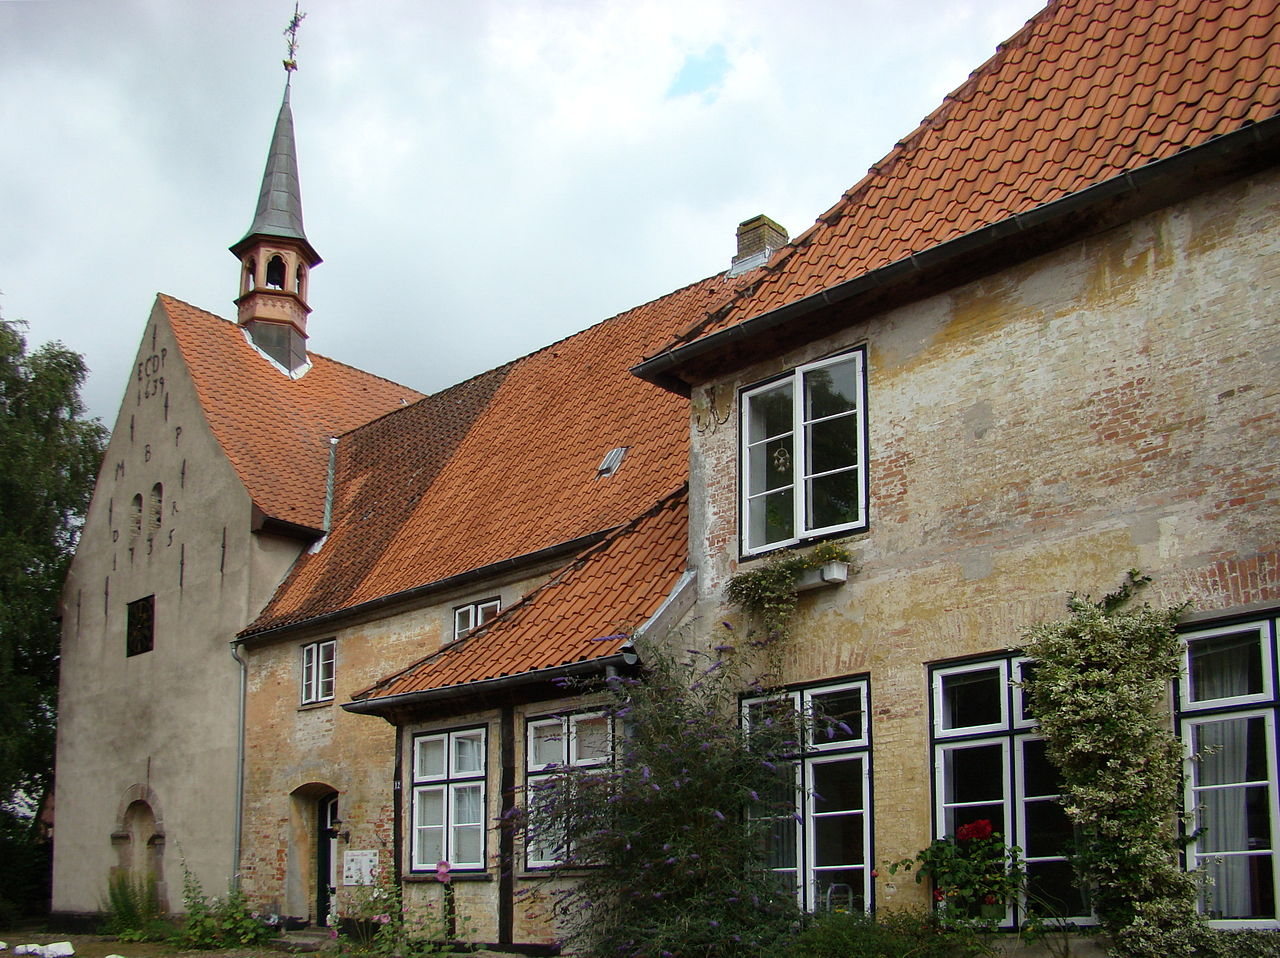 Bild St. Johanniskloster Schleswig